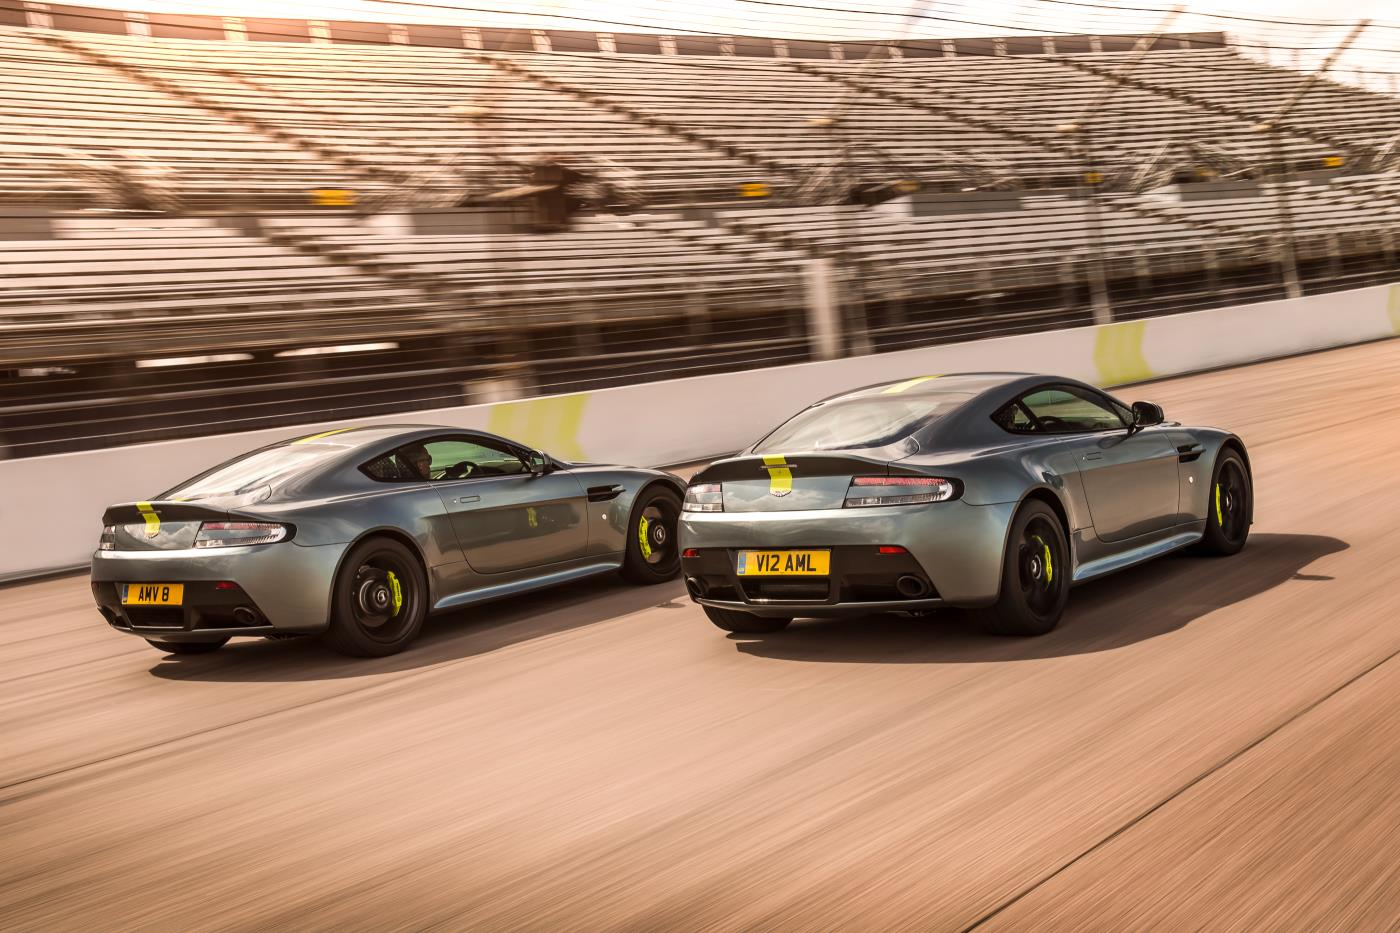 Aston Martin Vantage AMR enters production